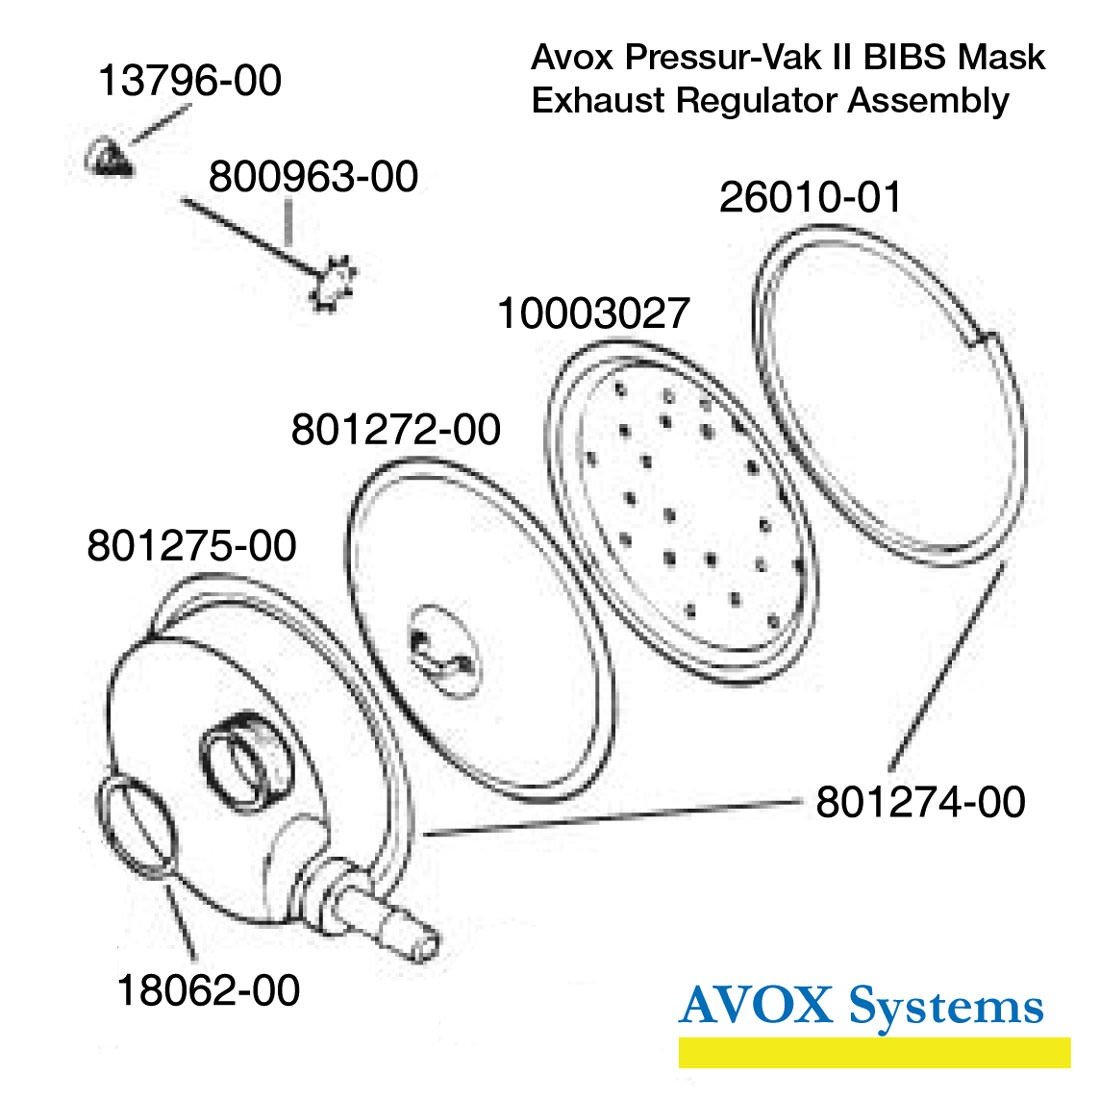 Avox Pressur Vak Ii Without Face Seal Harness 01 Xx